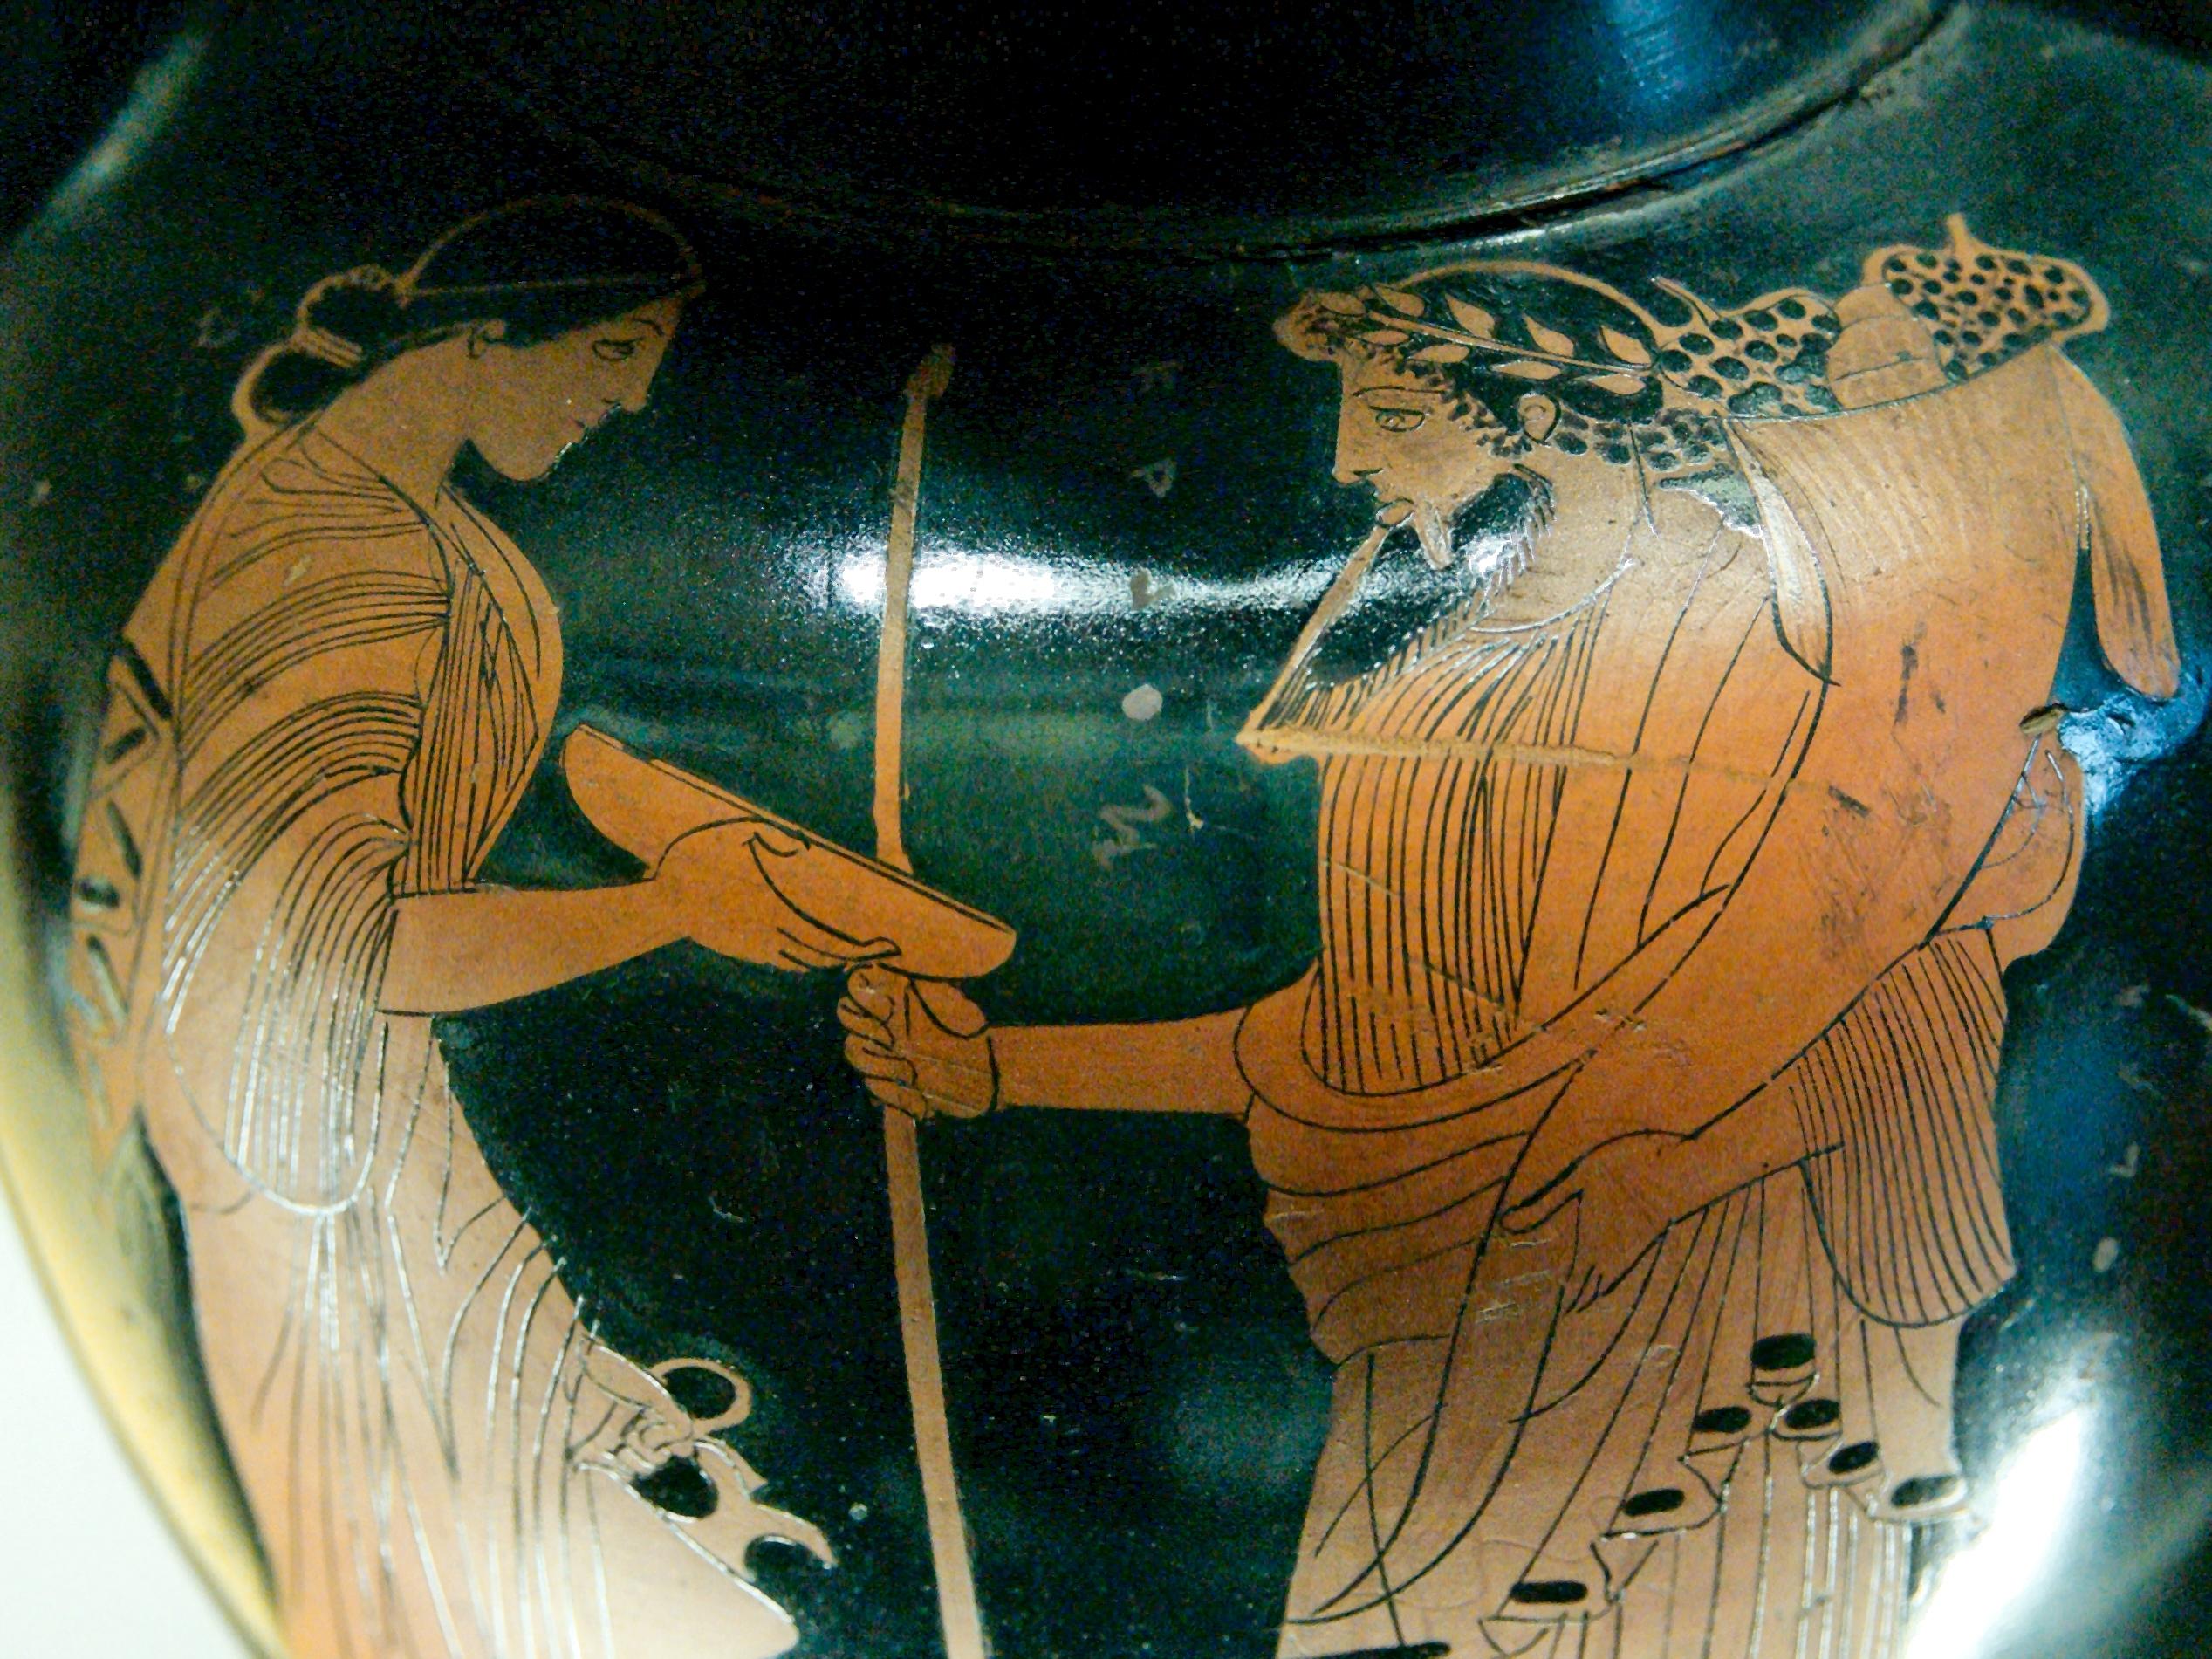 Hades | Grieksemithologie.jouwweb.nl